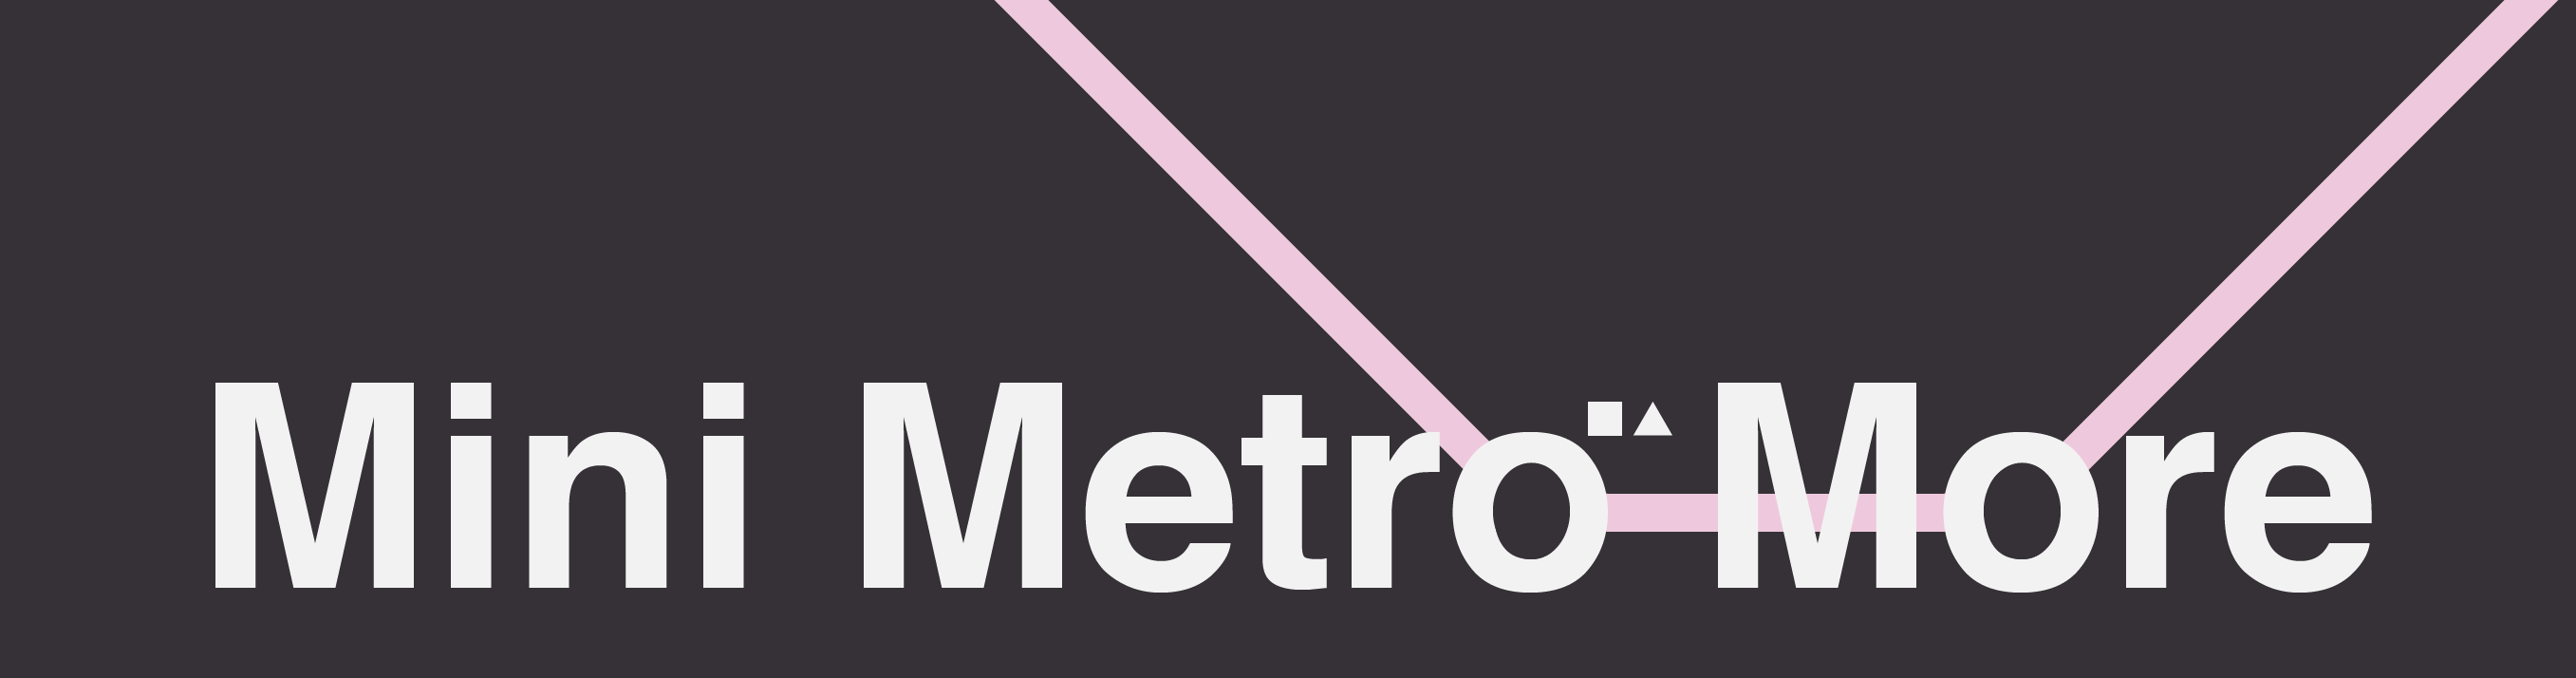 Mini Metro More